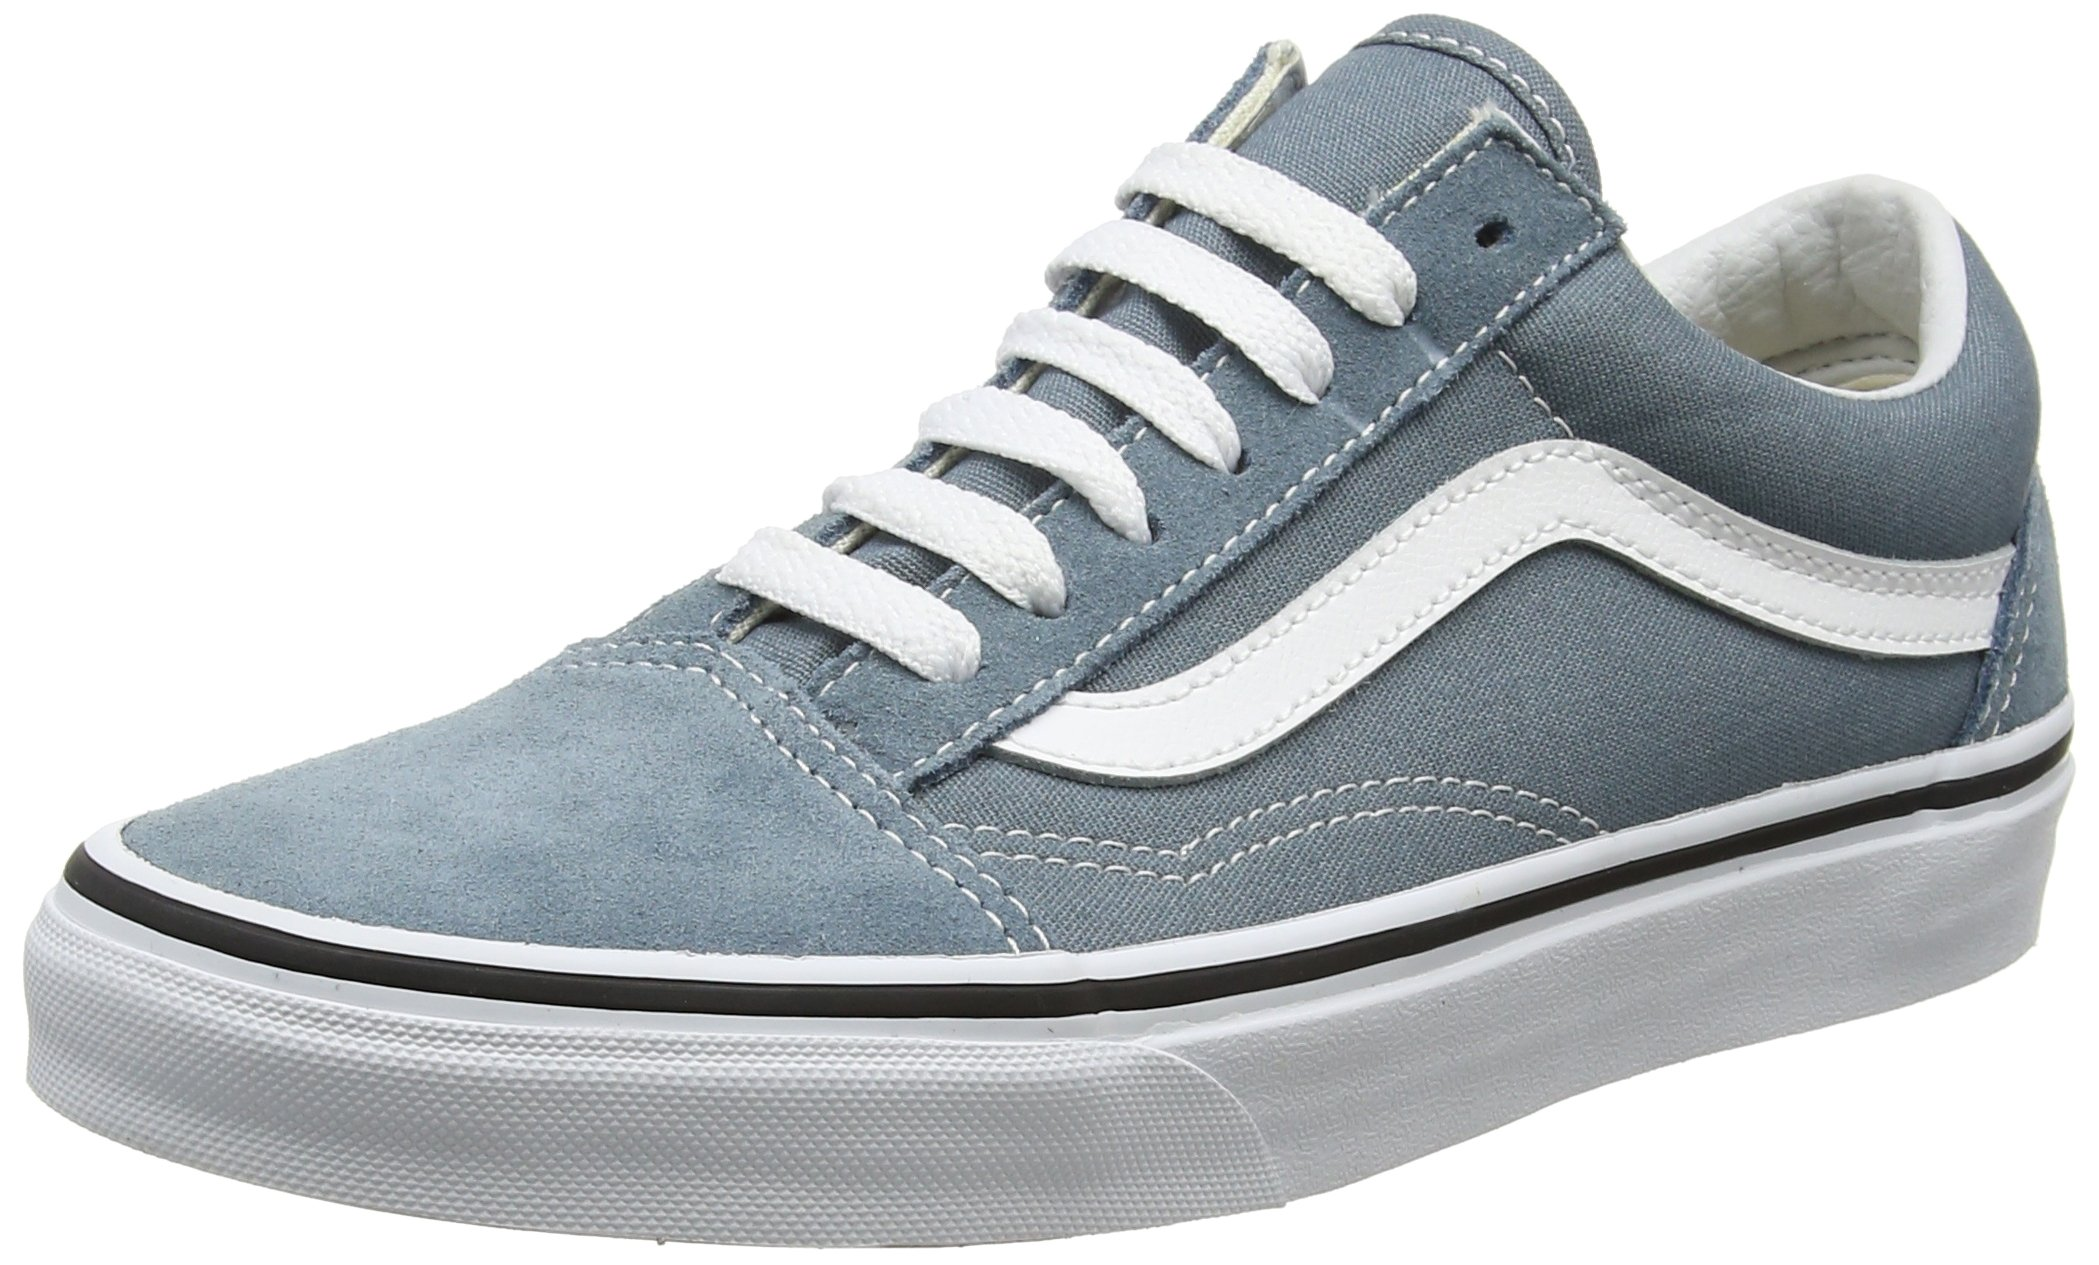 Vans Unisex Adults Old Skool Classic Suede/Canvas Sneakers, Blue (Goblin Blue/True White), 5 UK (38 EU)